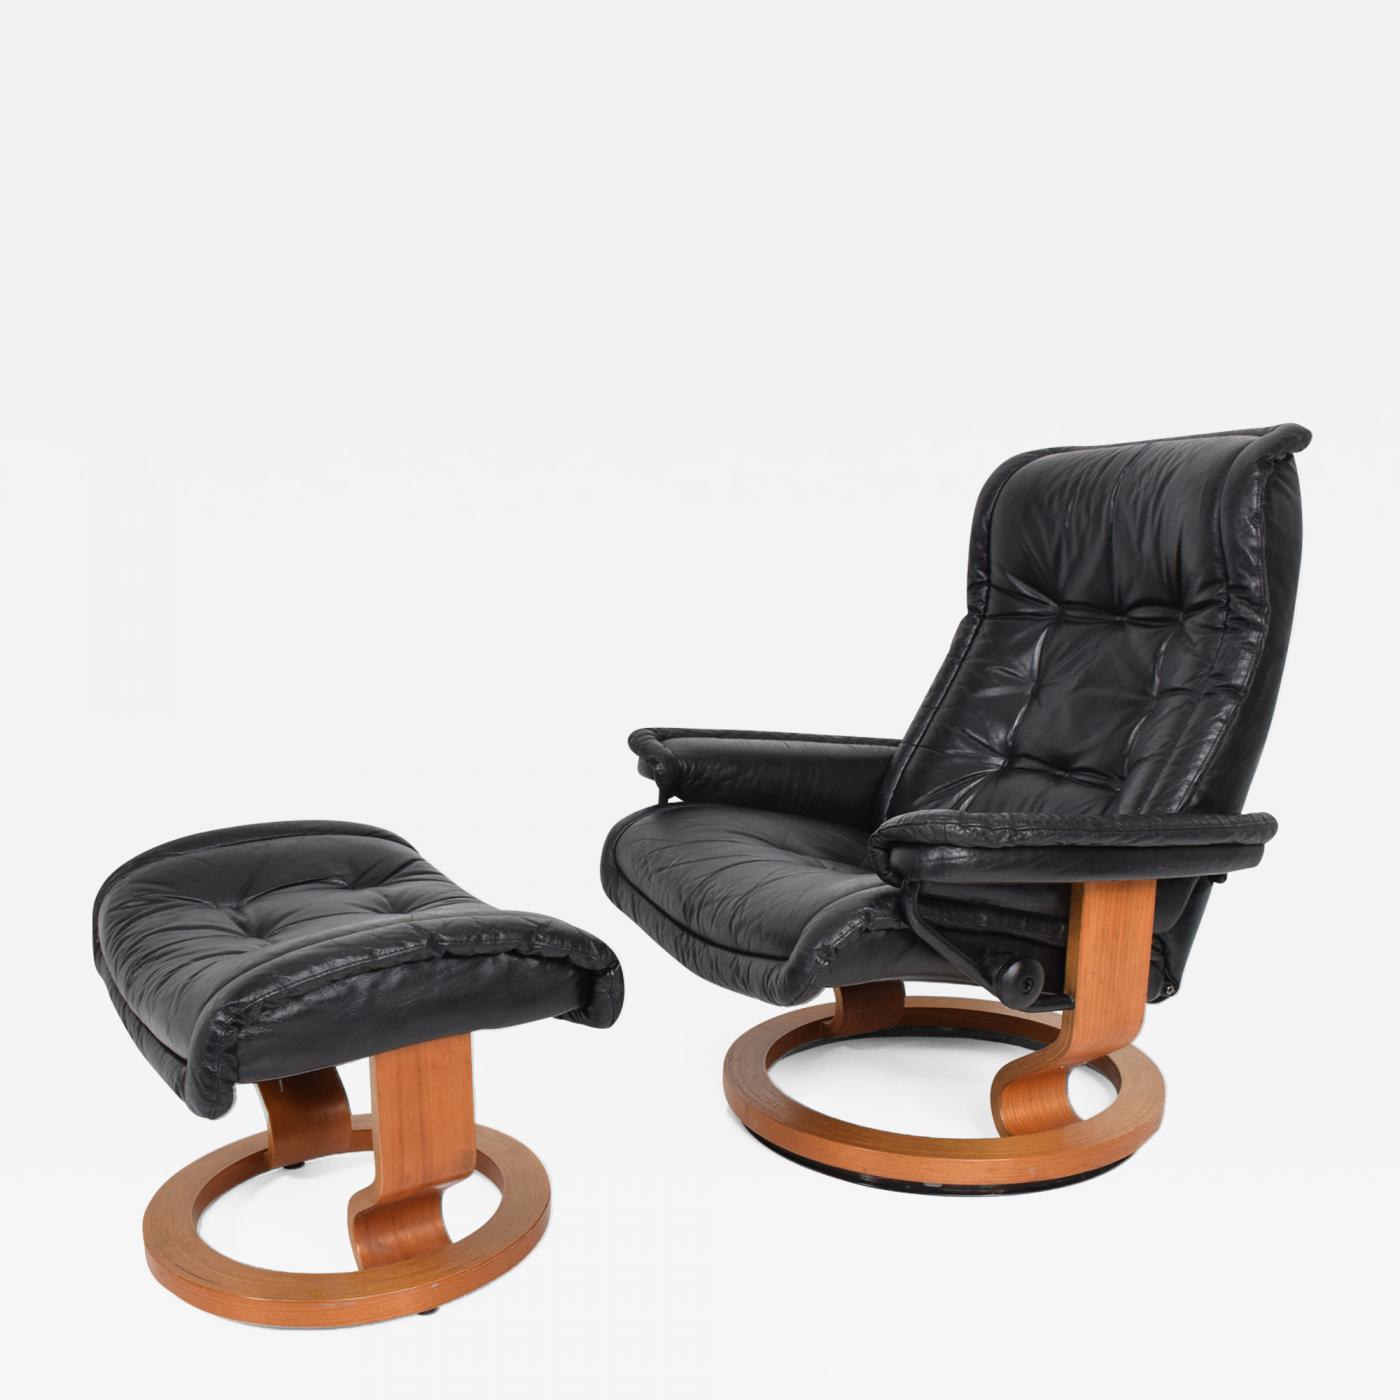 new product ad443 6bf91 Ekornes Stressless - Vintage Scandinavian Modern Ekornes Stressless  Recliner Chair & Ottoman